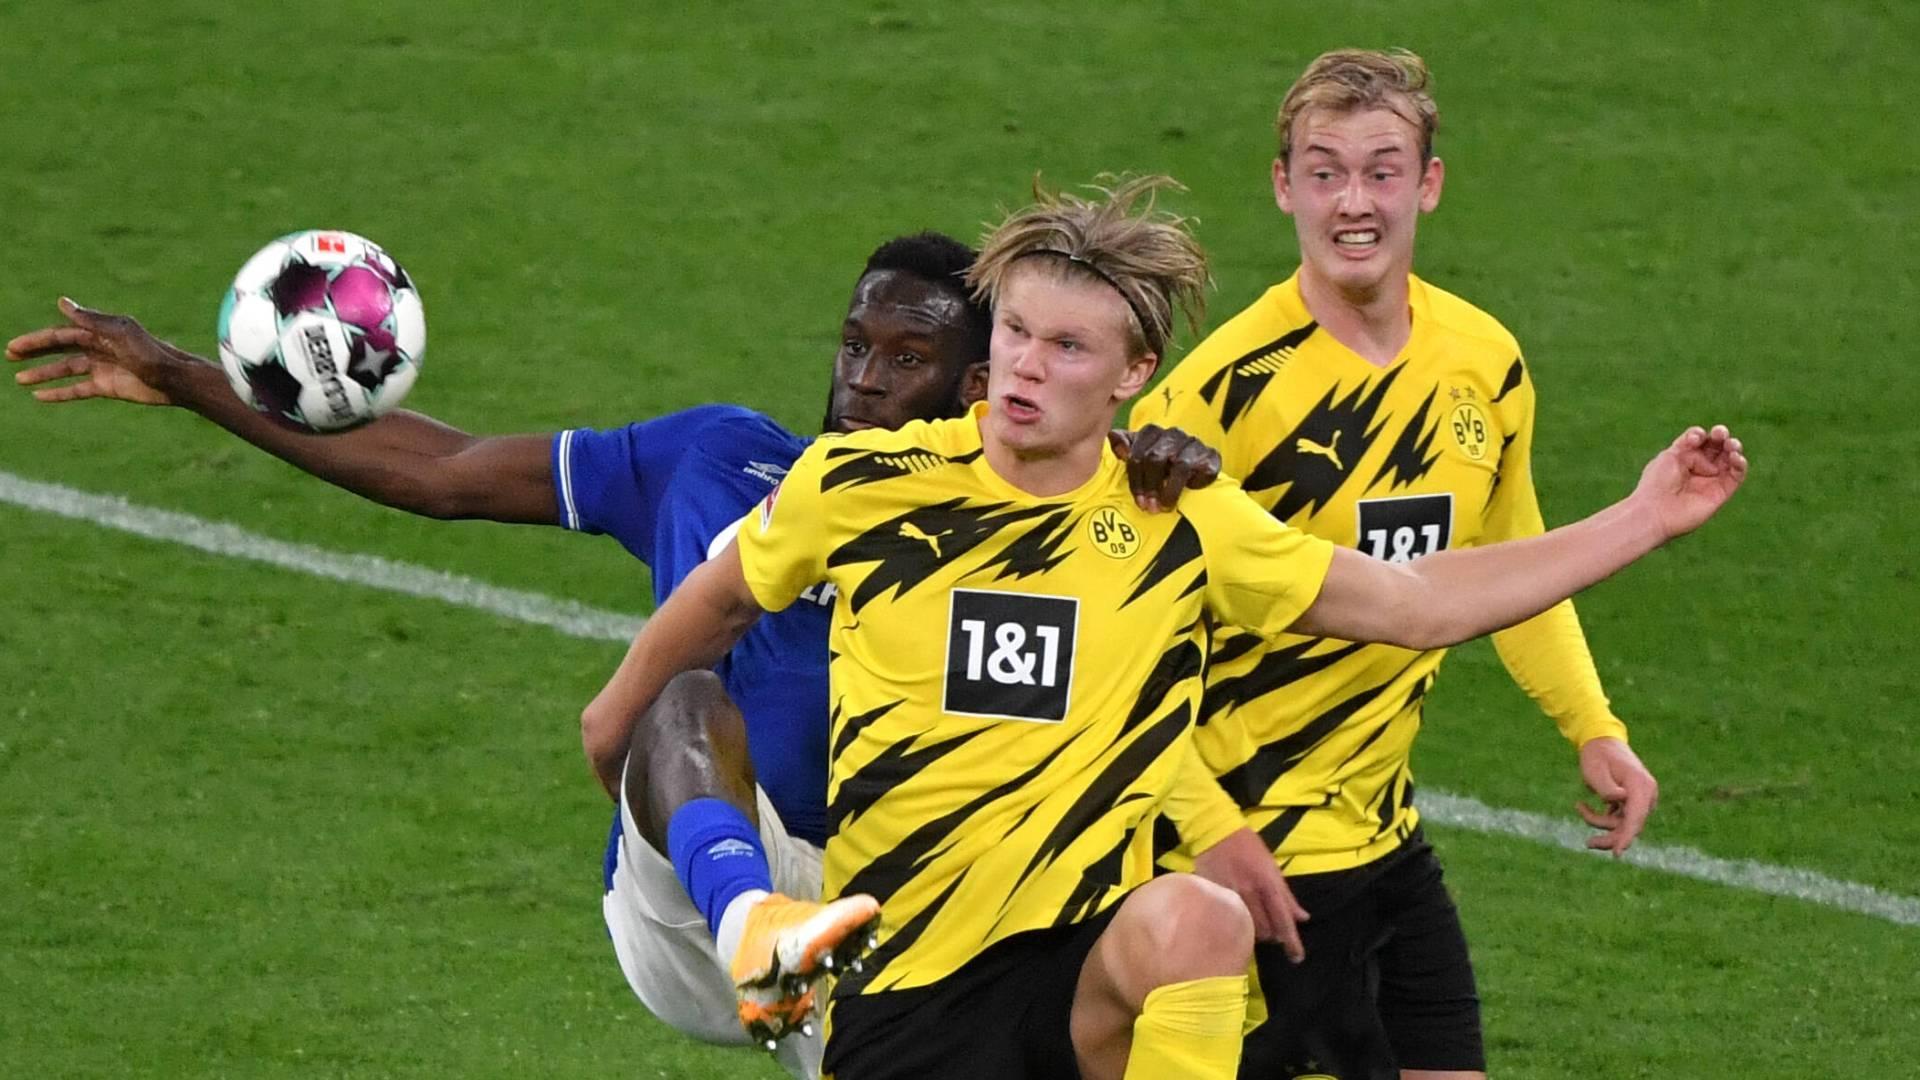 BVB (Borussia Dortmund) vs. 1. FC Köln live im TV und ...